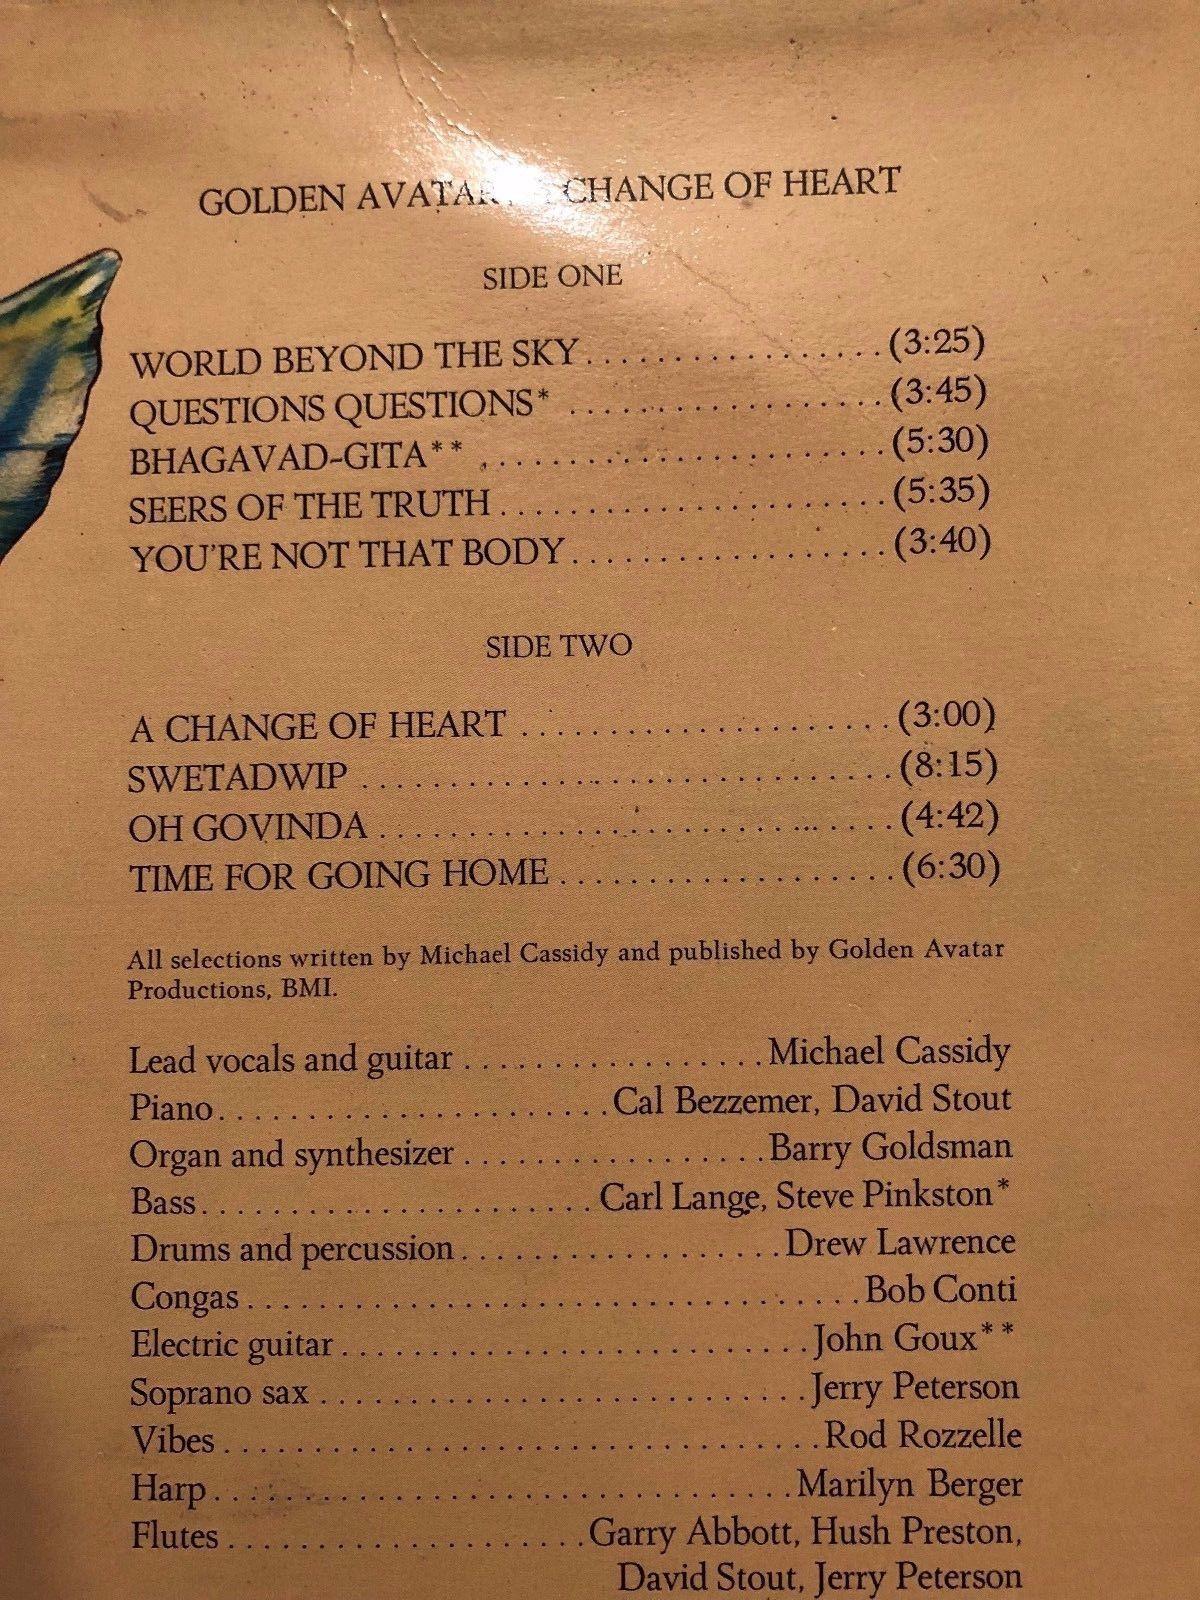 "1976 GOLDEN AVATAR ""A CHANGE OF HEART"" VINYL LP ALBUM RECORD"